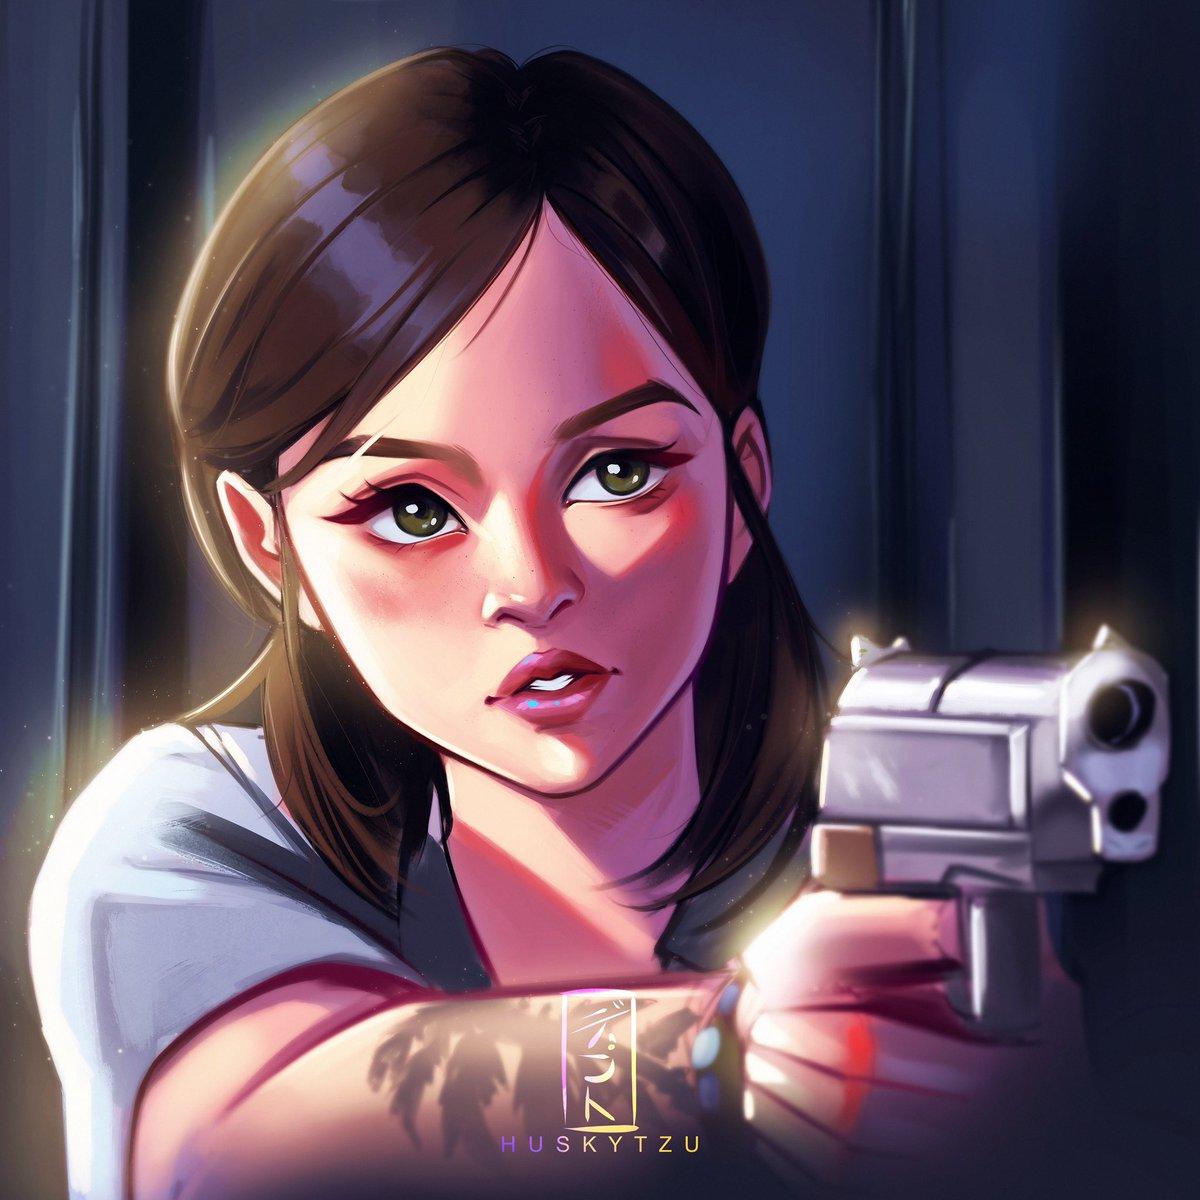 Ellie Fanart from the lastes State of Play demo ✨ #TheLastofUsPartII #ellie #videogames #fanart #badass #digitalart #ipadpro #illustration #fanart